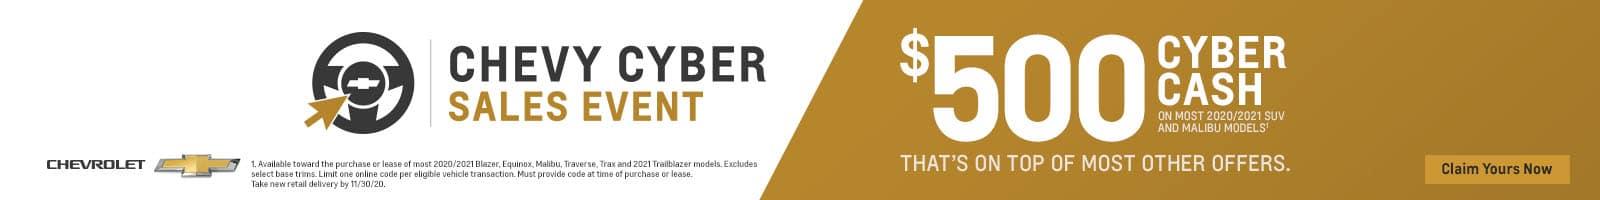 01_2020_NOVEMBER_ 500 CYBER CASH GENERIC_NATIONAL_1600x200 BANNER